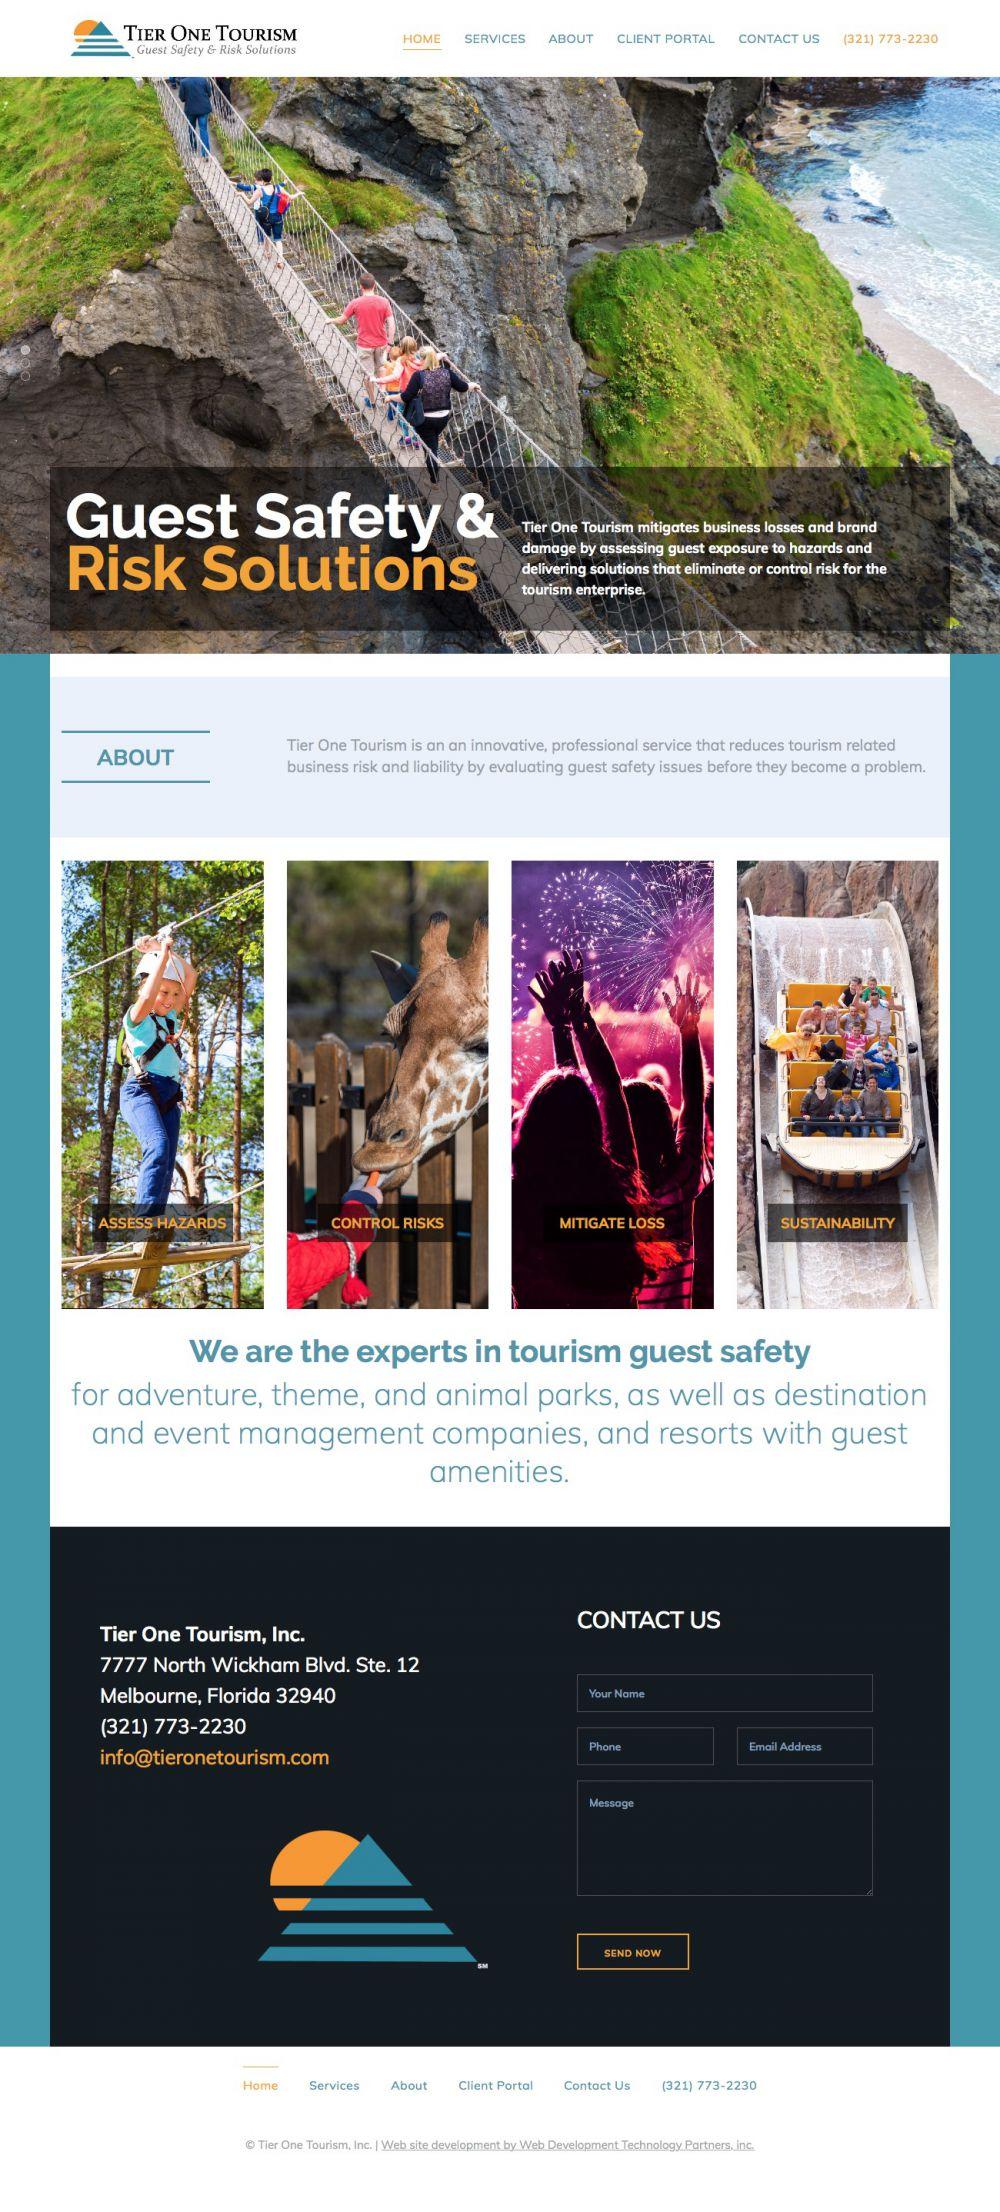 Tier One Tourism 2018